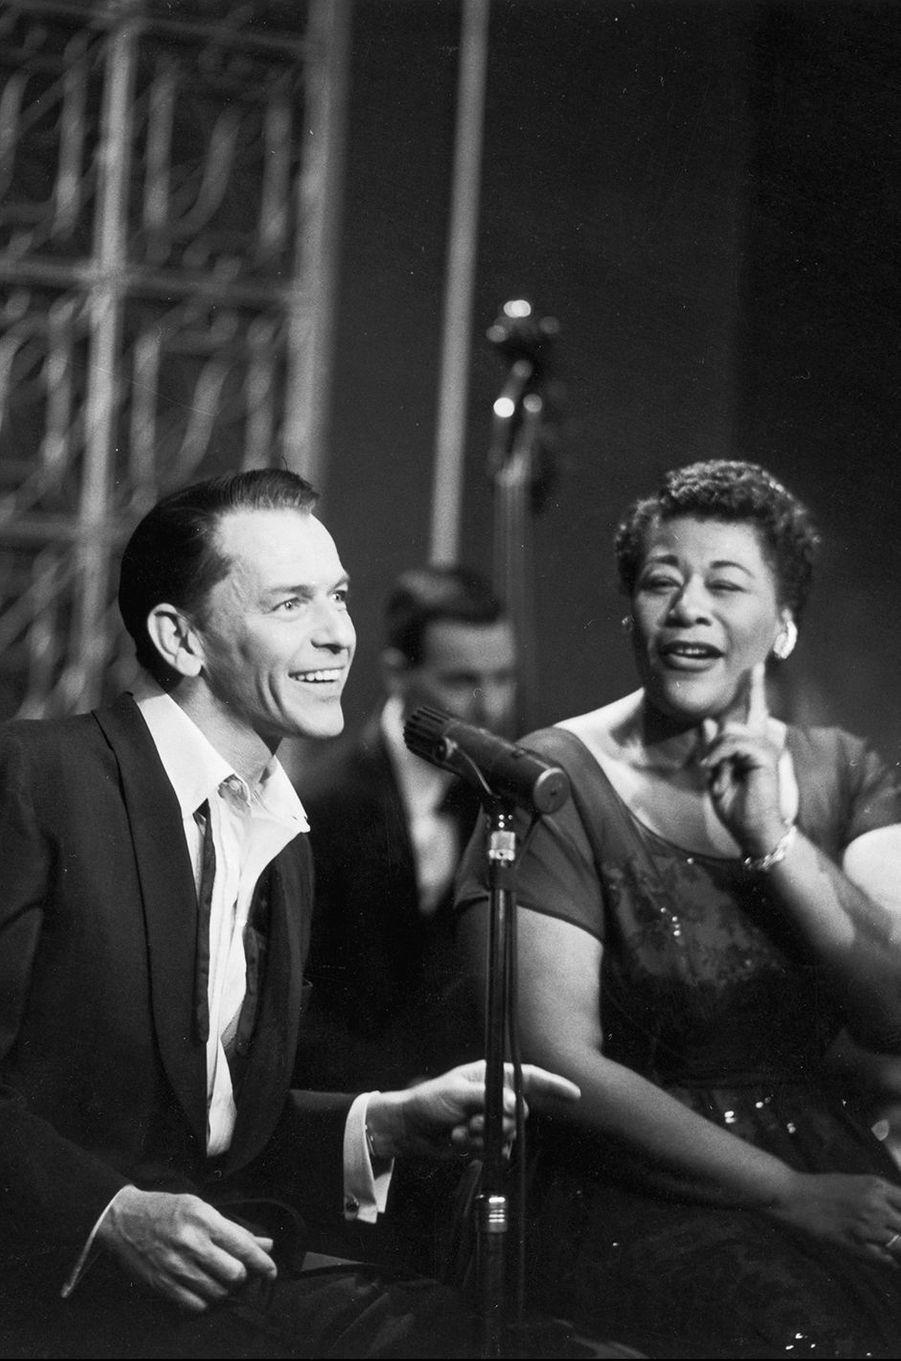 Duo au sommet entre Frank Sinatra et Ella Fitzgerald, 1955